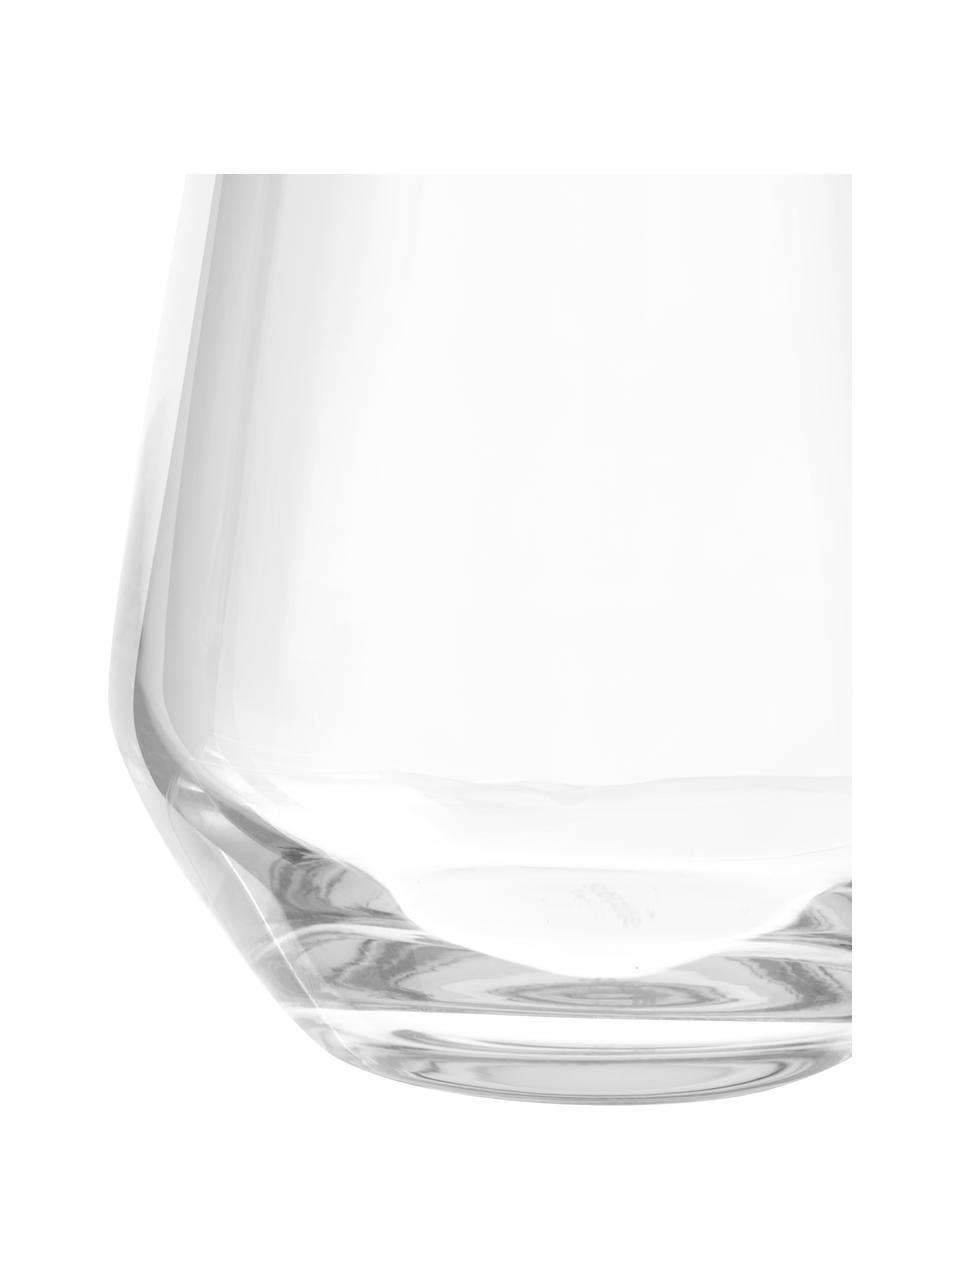 Bolvormige glazen Revolution, 6 stuks, Kristalglas, Transparant, Ø 9 x H 11 cm